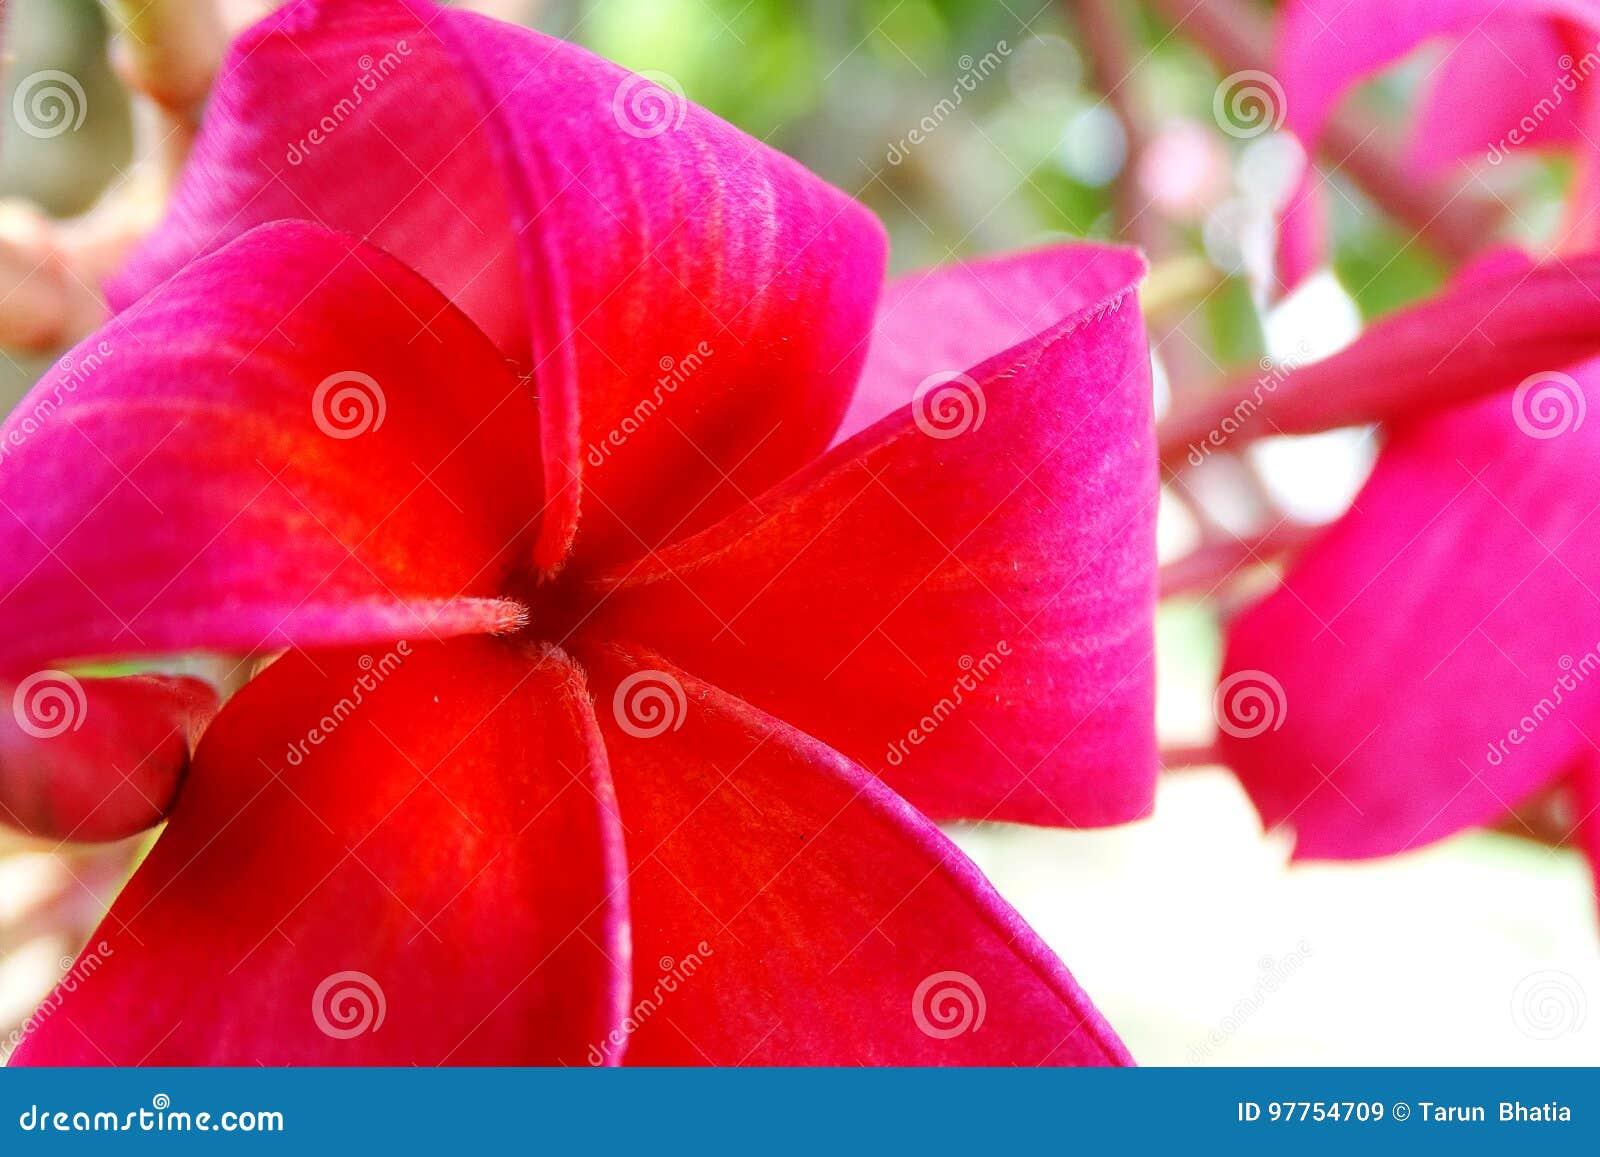 Plumeria Flower stock image. Image of apocynaceae, portrait - 97754709